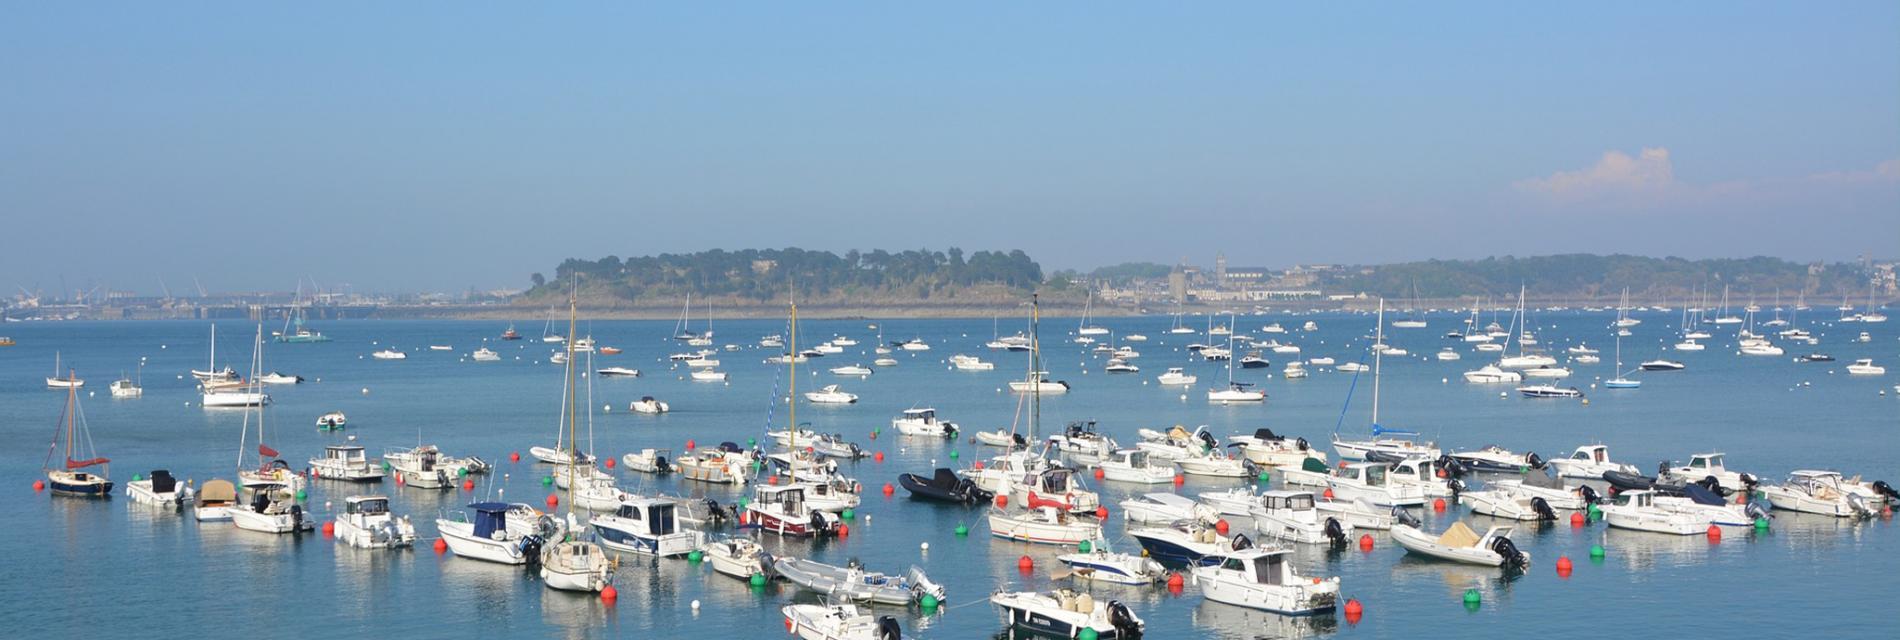 Slide Le port de Dinard